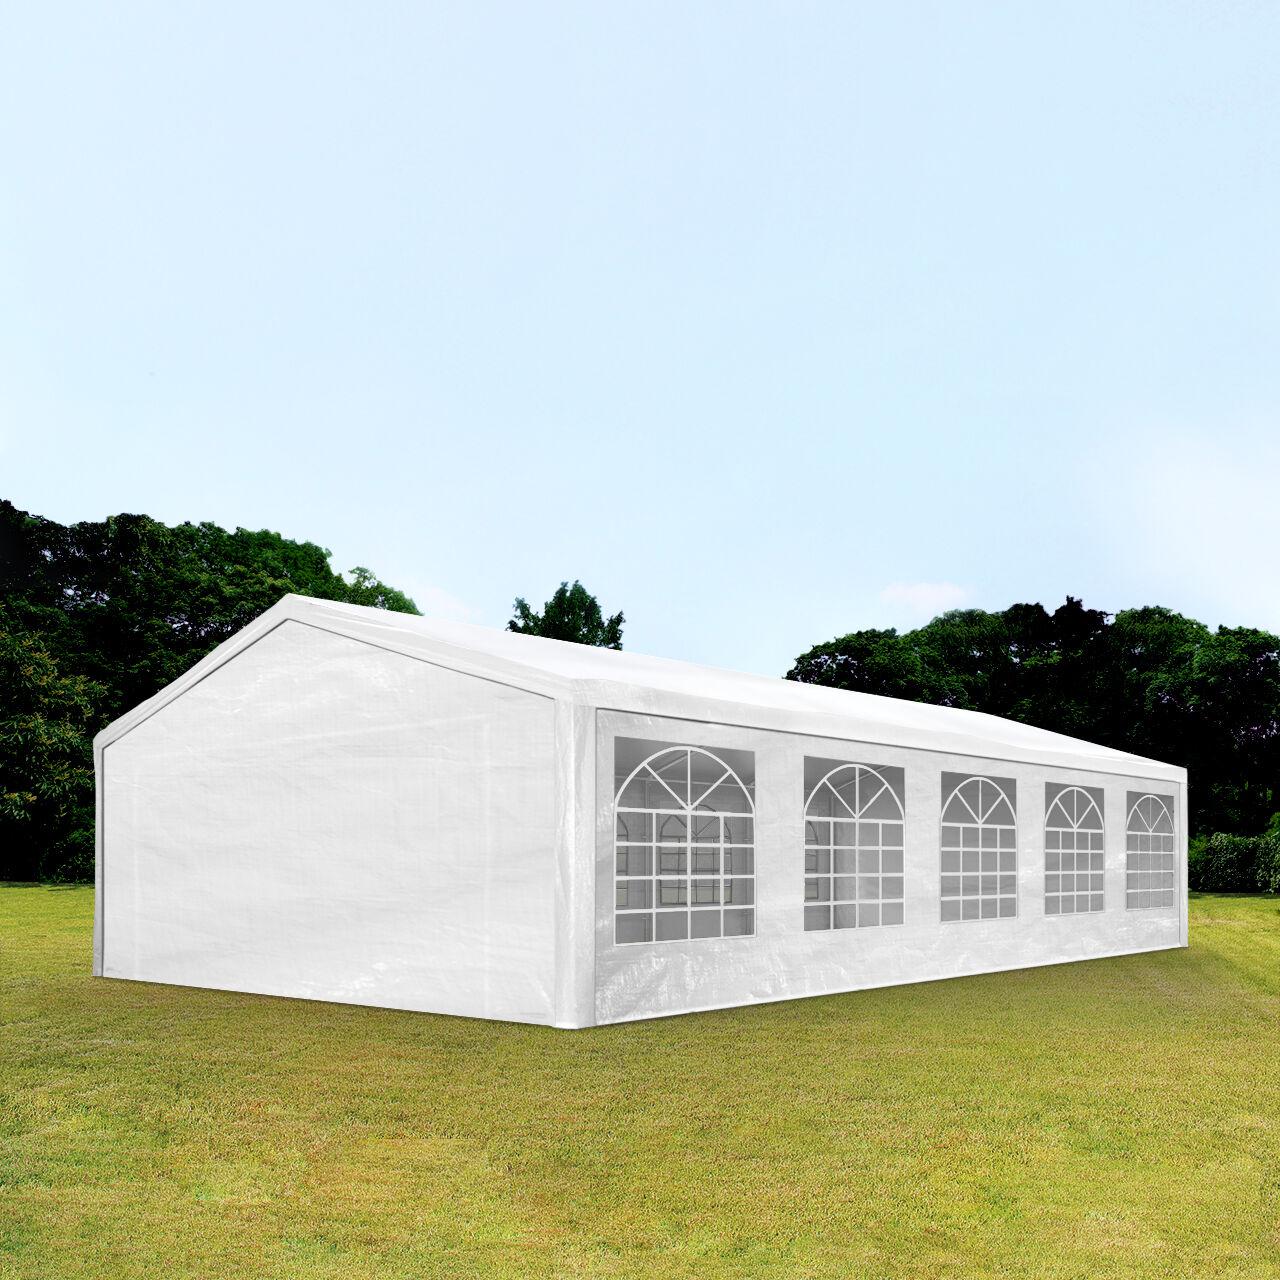 Toolport Tendone per Feste 5x10m PE 180g/m² bianco impermeabile